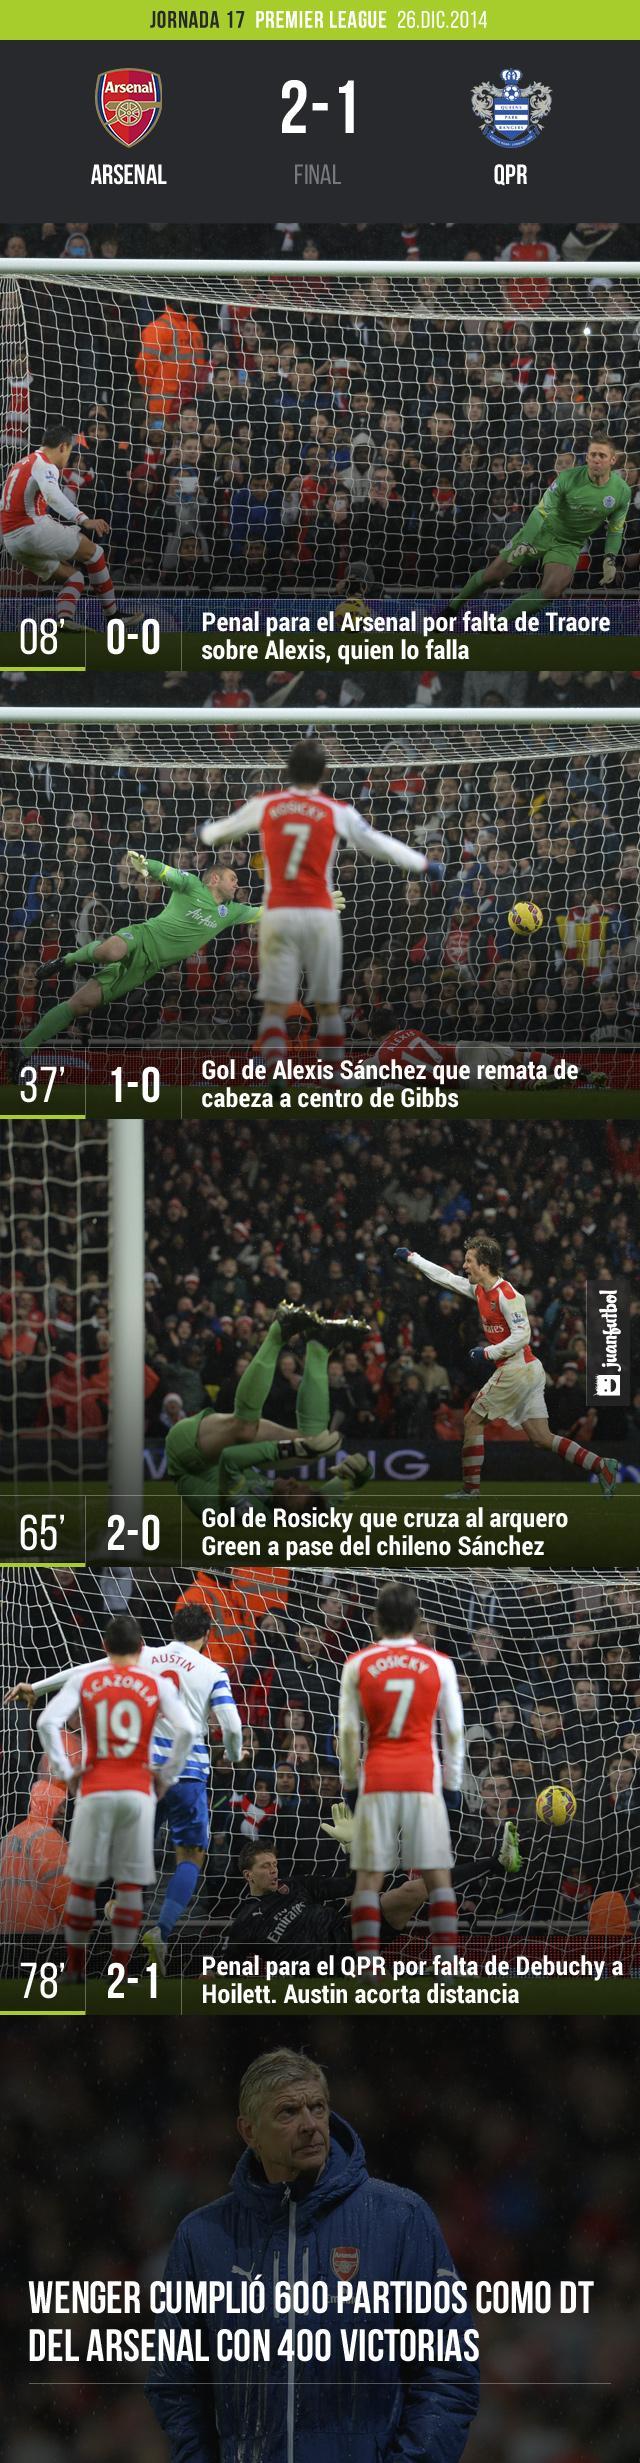 Crónica de Arsenal 2-1 QPR.